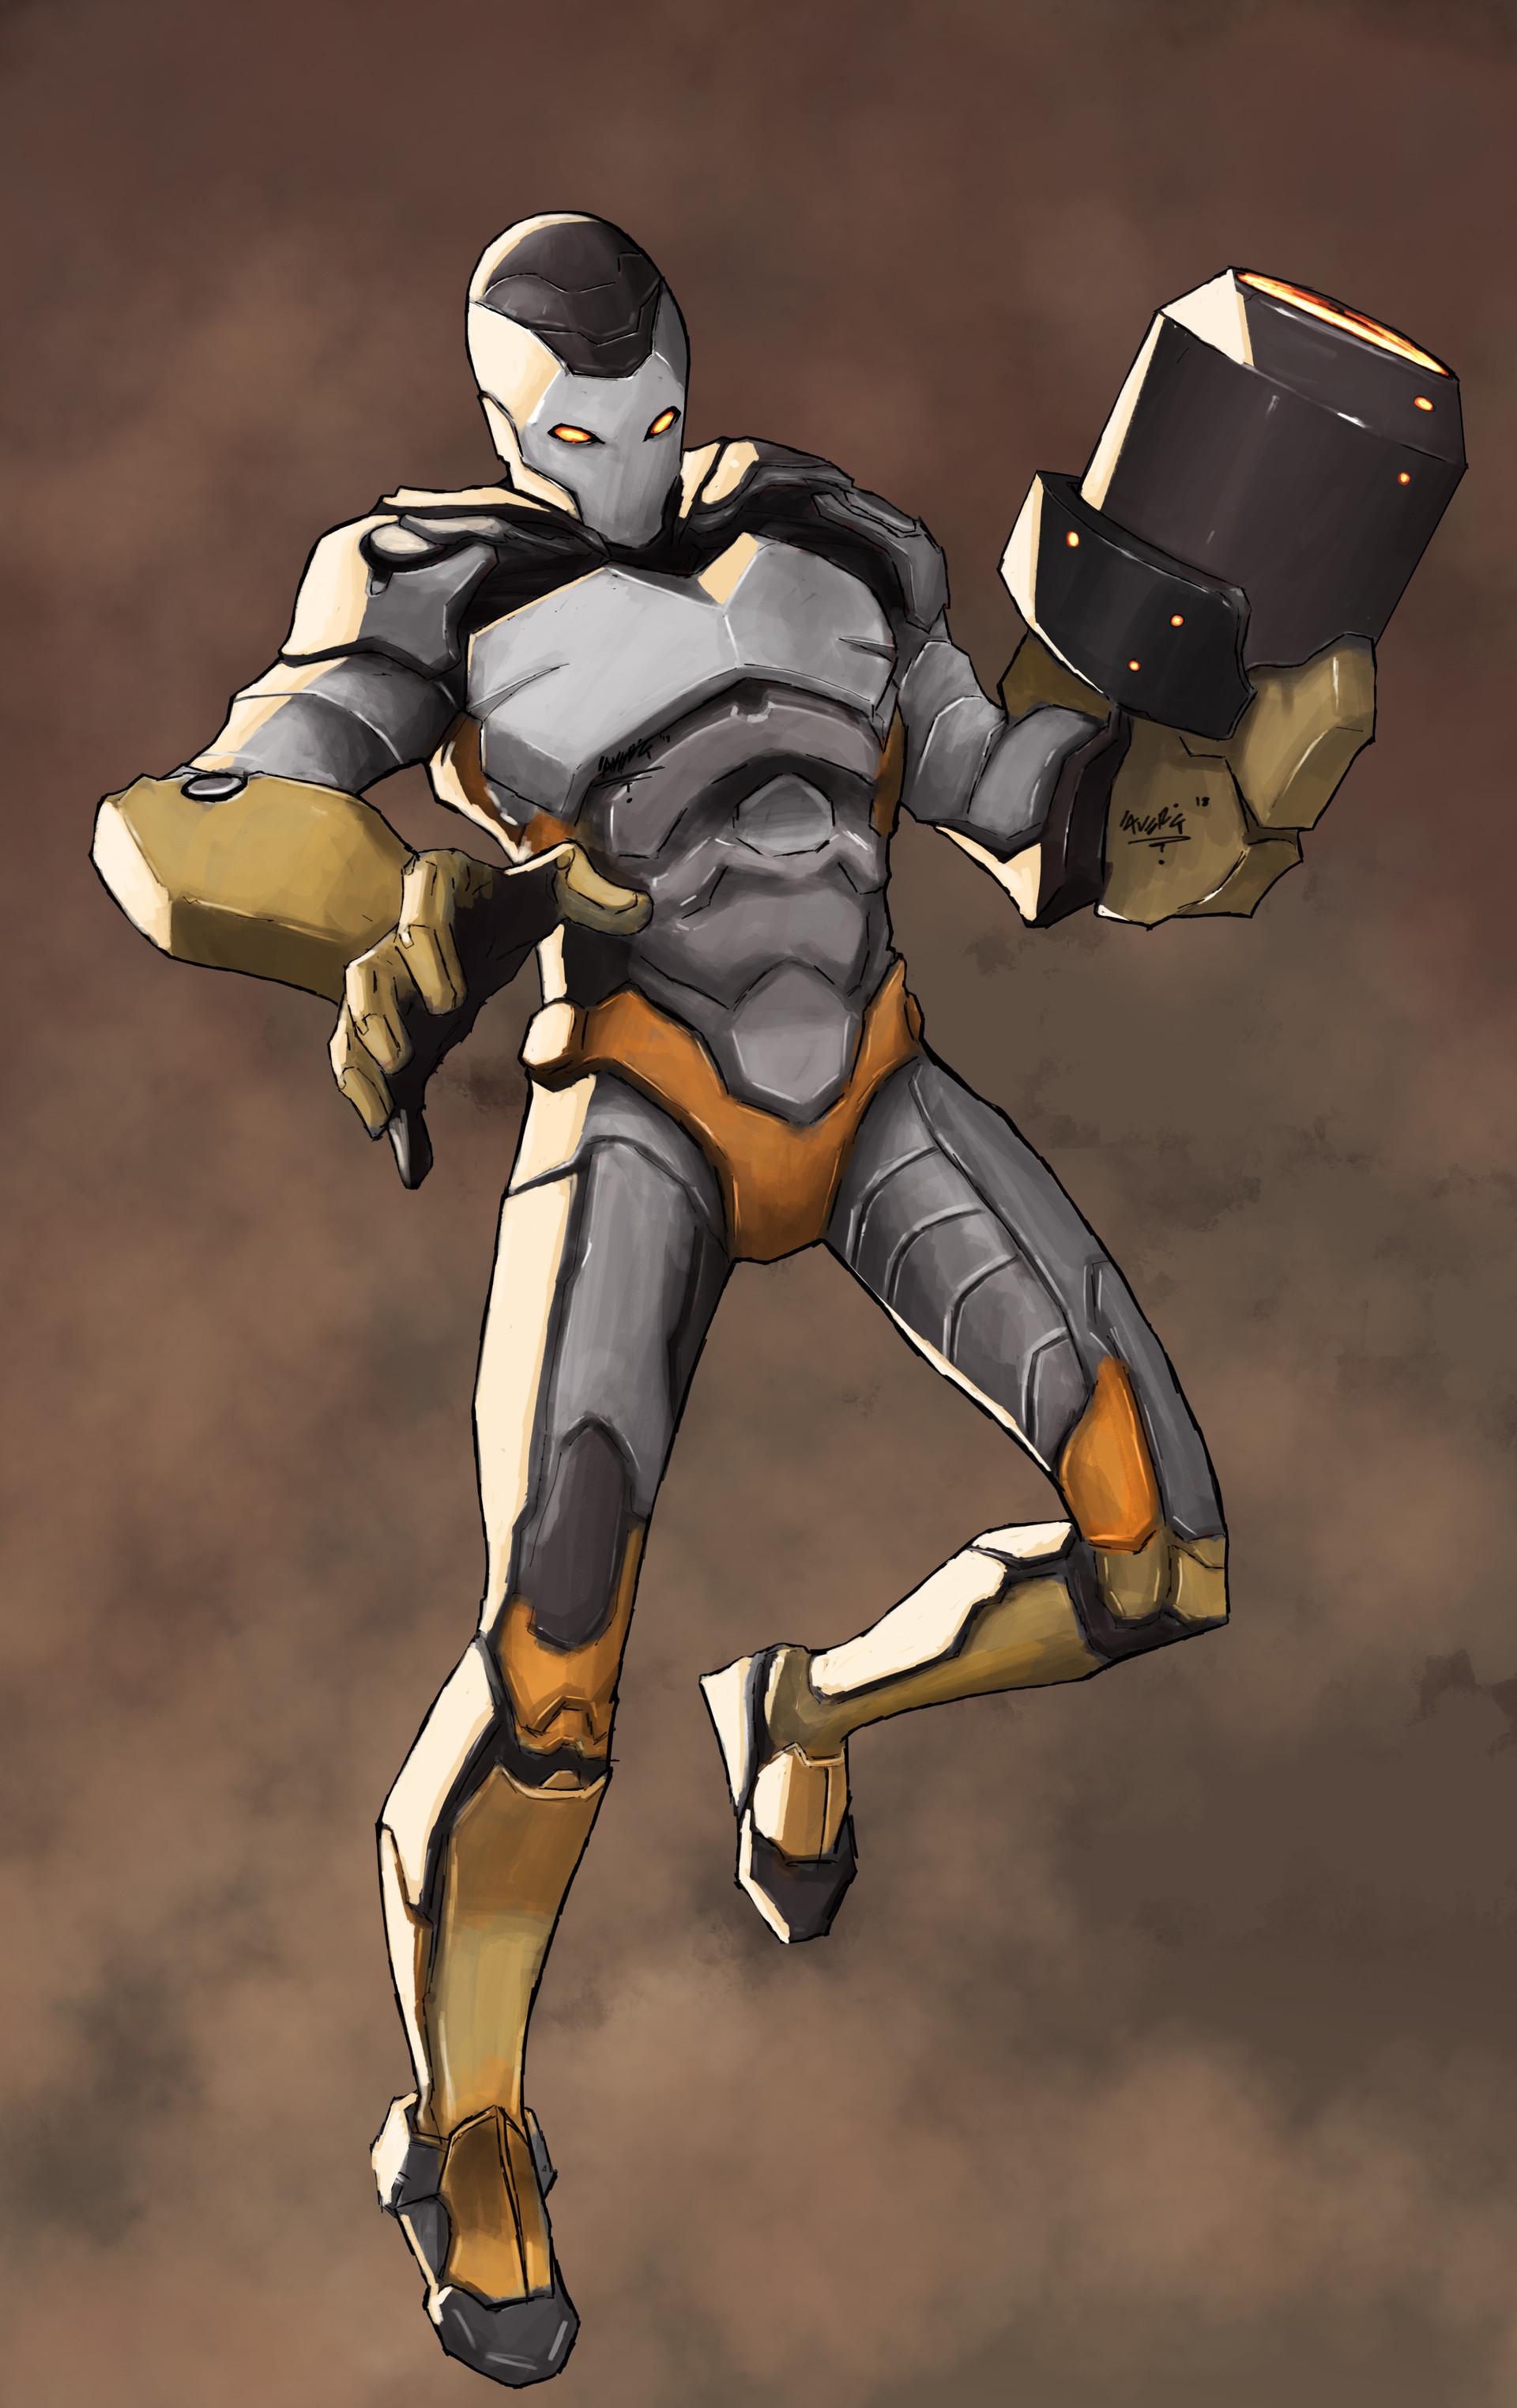 Gbenle maverick cyborg 11